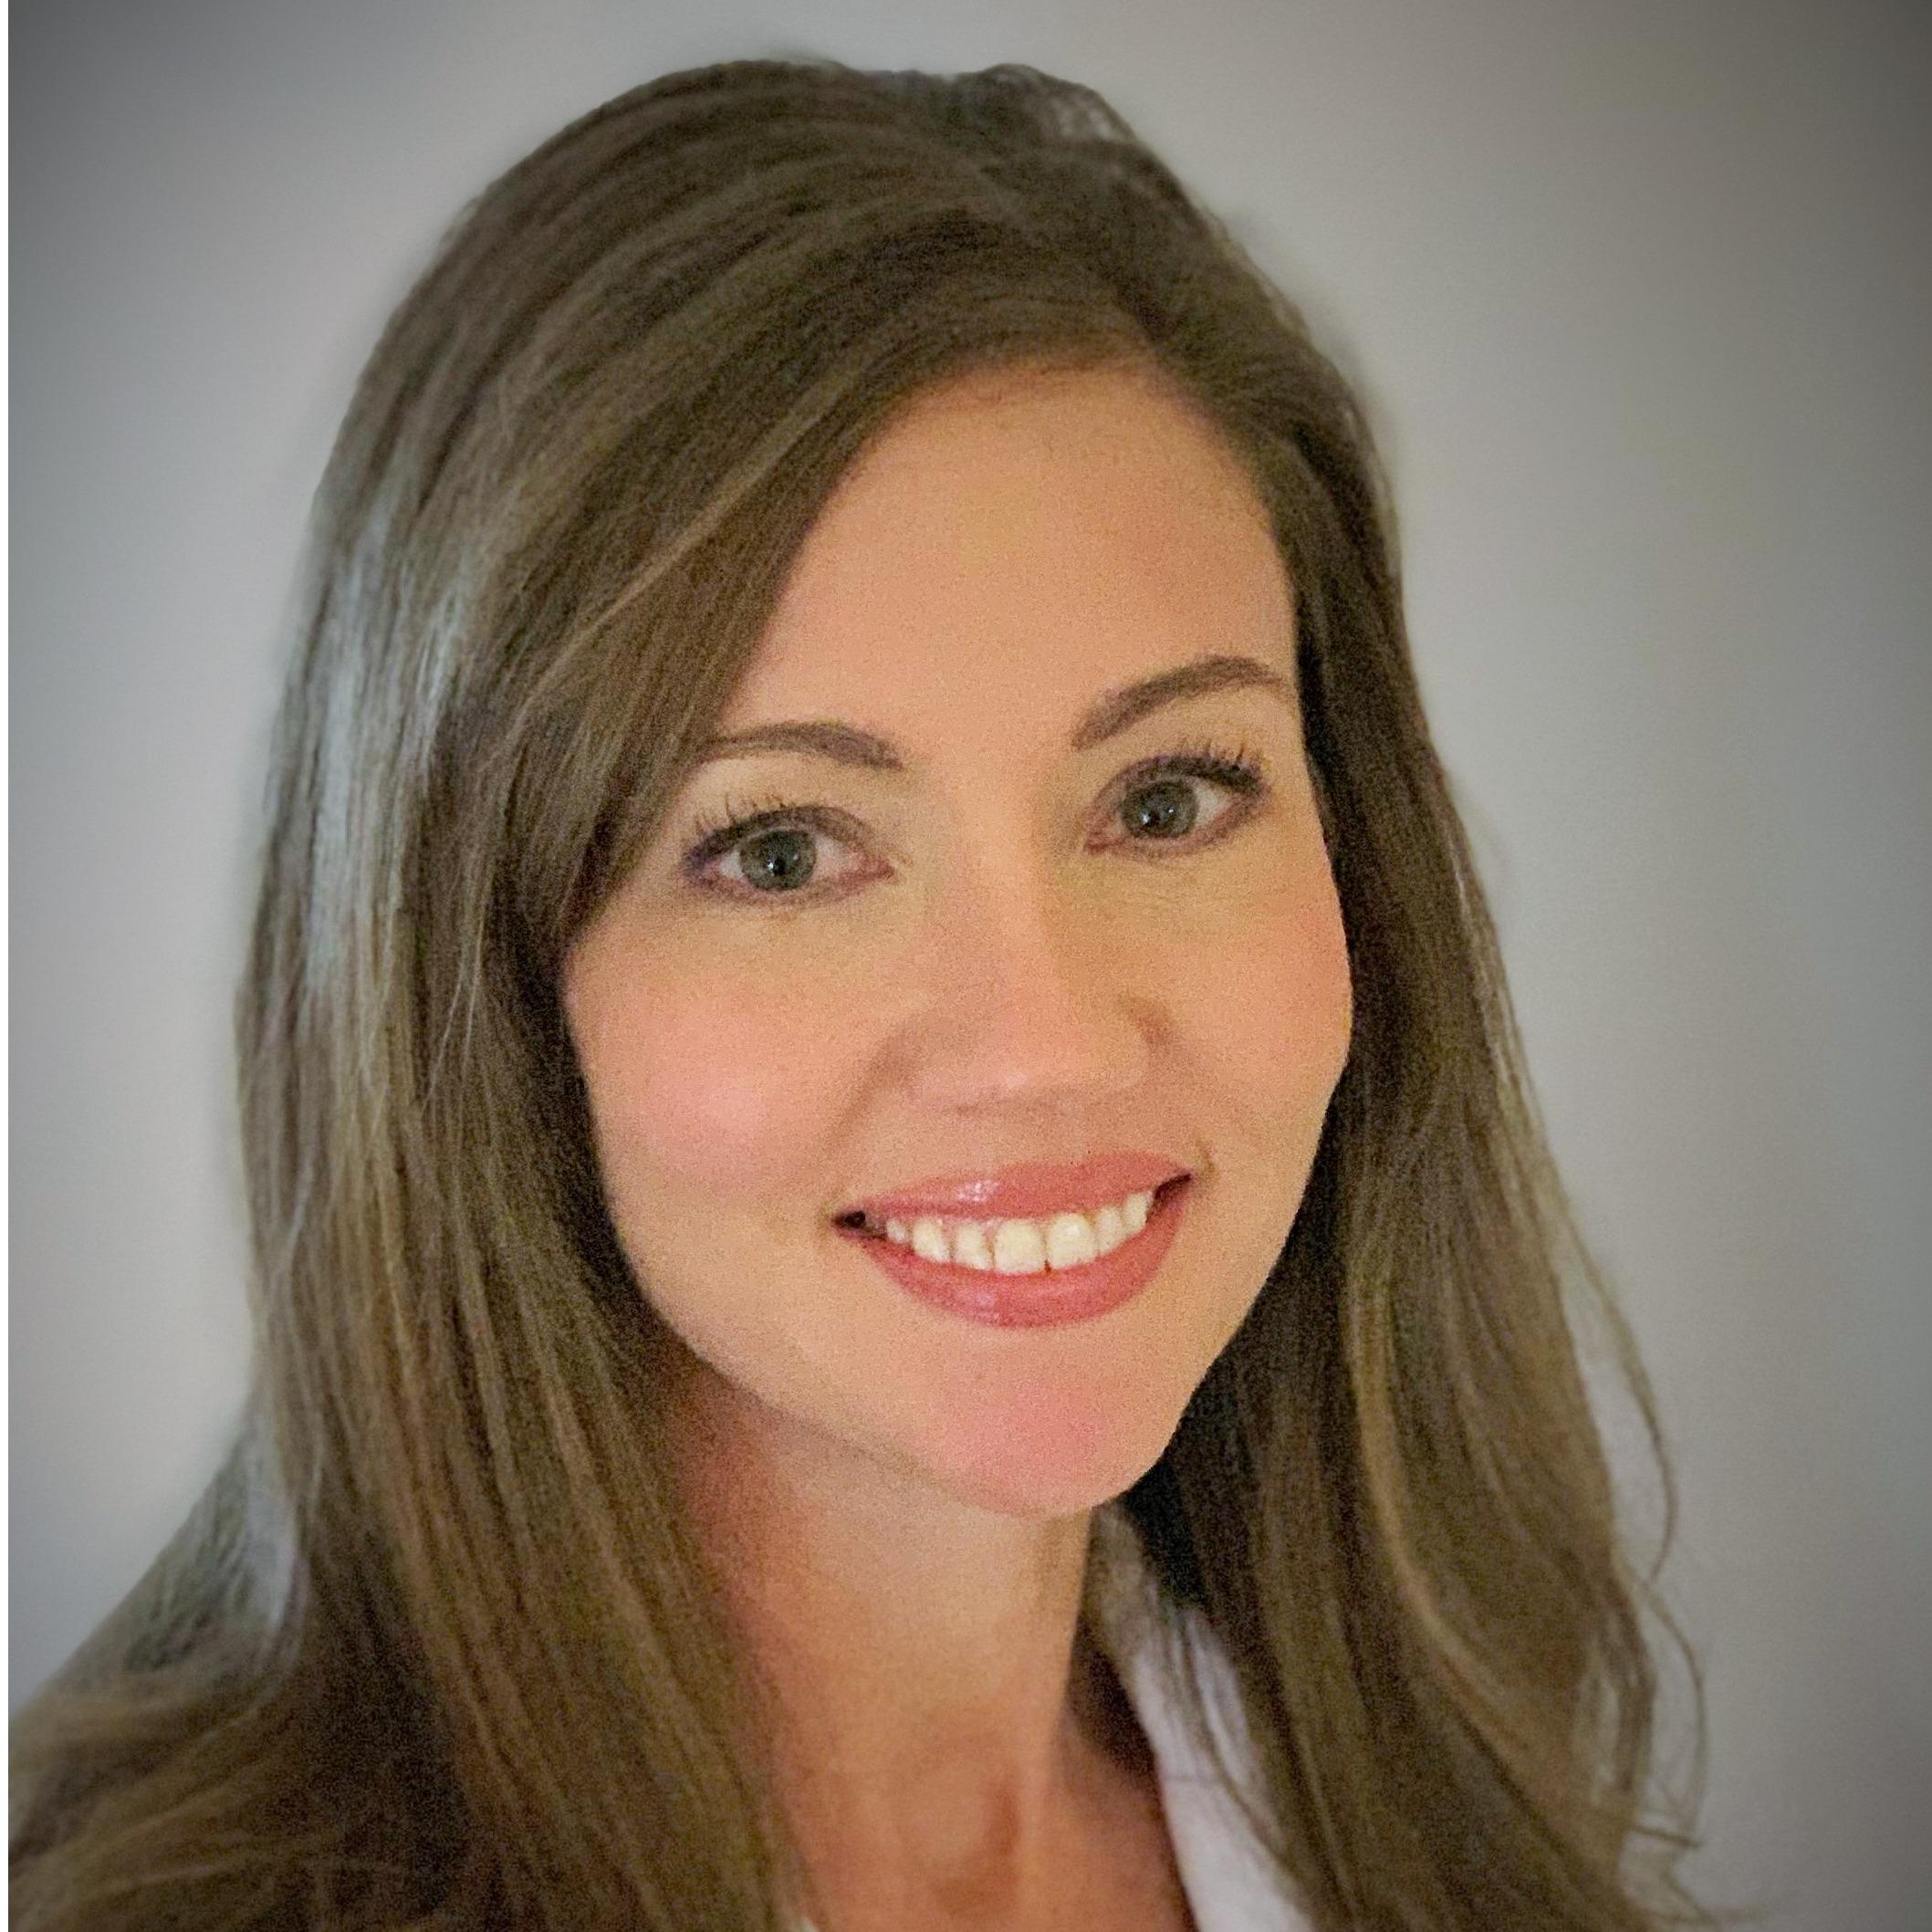 Dr. Angela Didyk DPM, FACFAS image 1